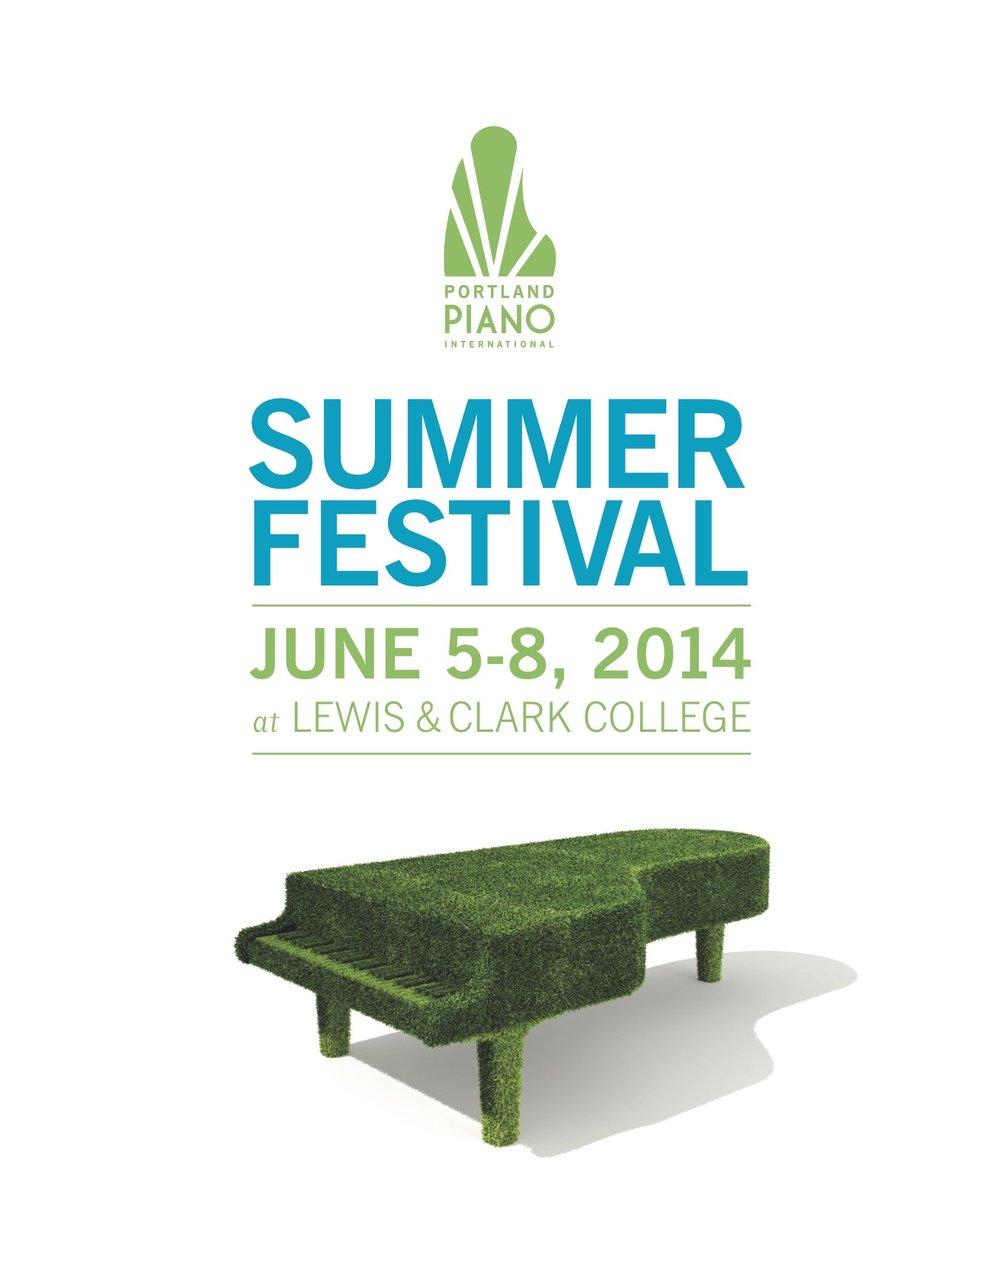 SummerFestival2014_1.jpg